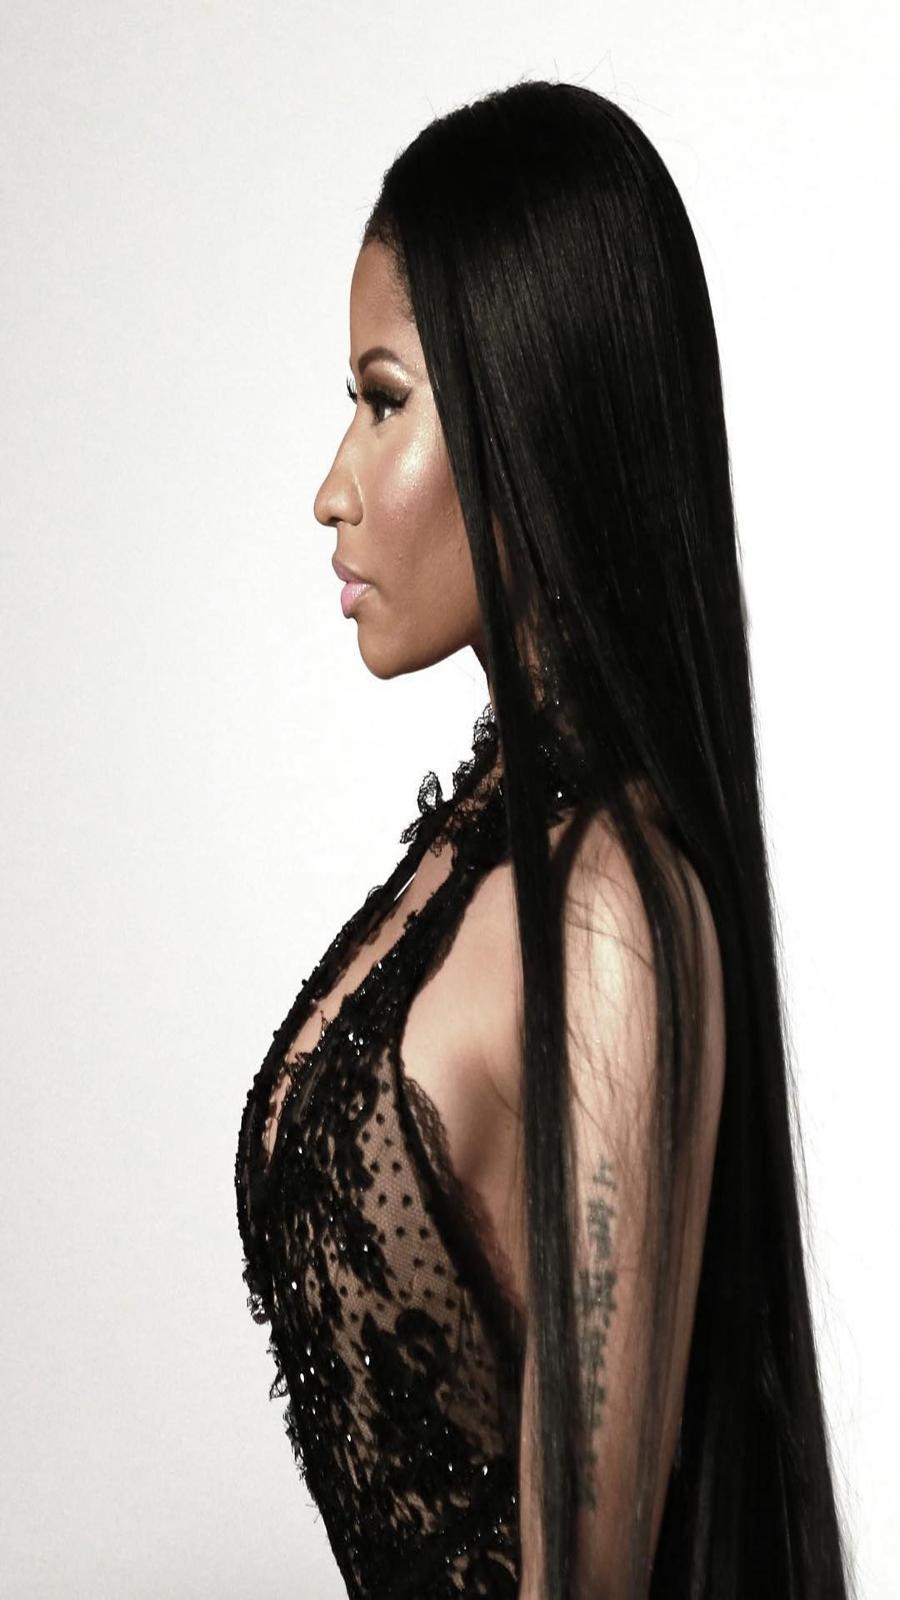 Nicki Minaj Side View HD Wallpapers